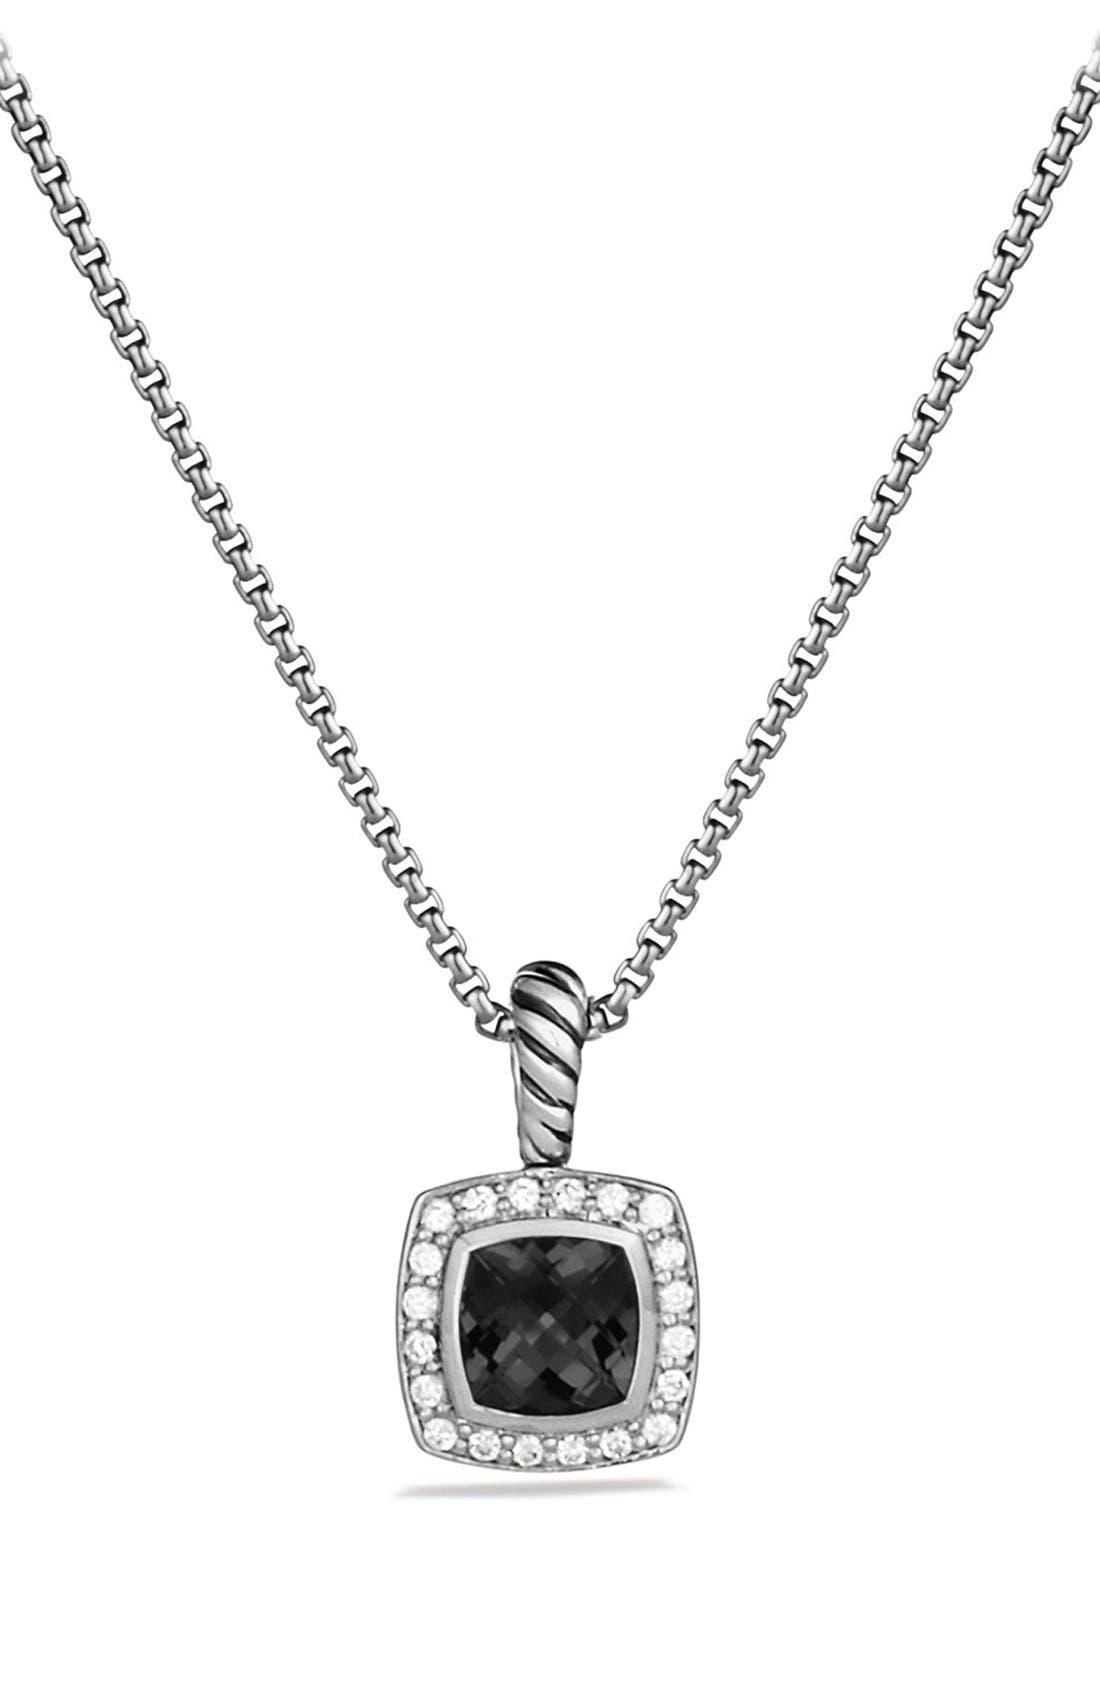 David Yurman 'Albion' Petite Pendant with Semiprecious Stone & Diamonds on Chain